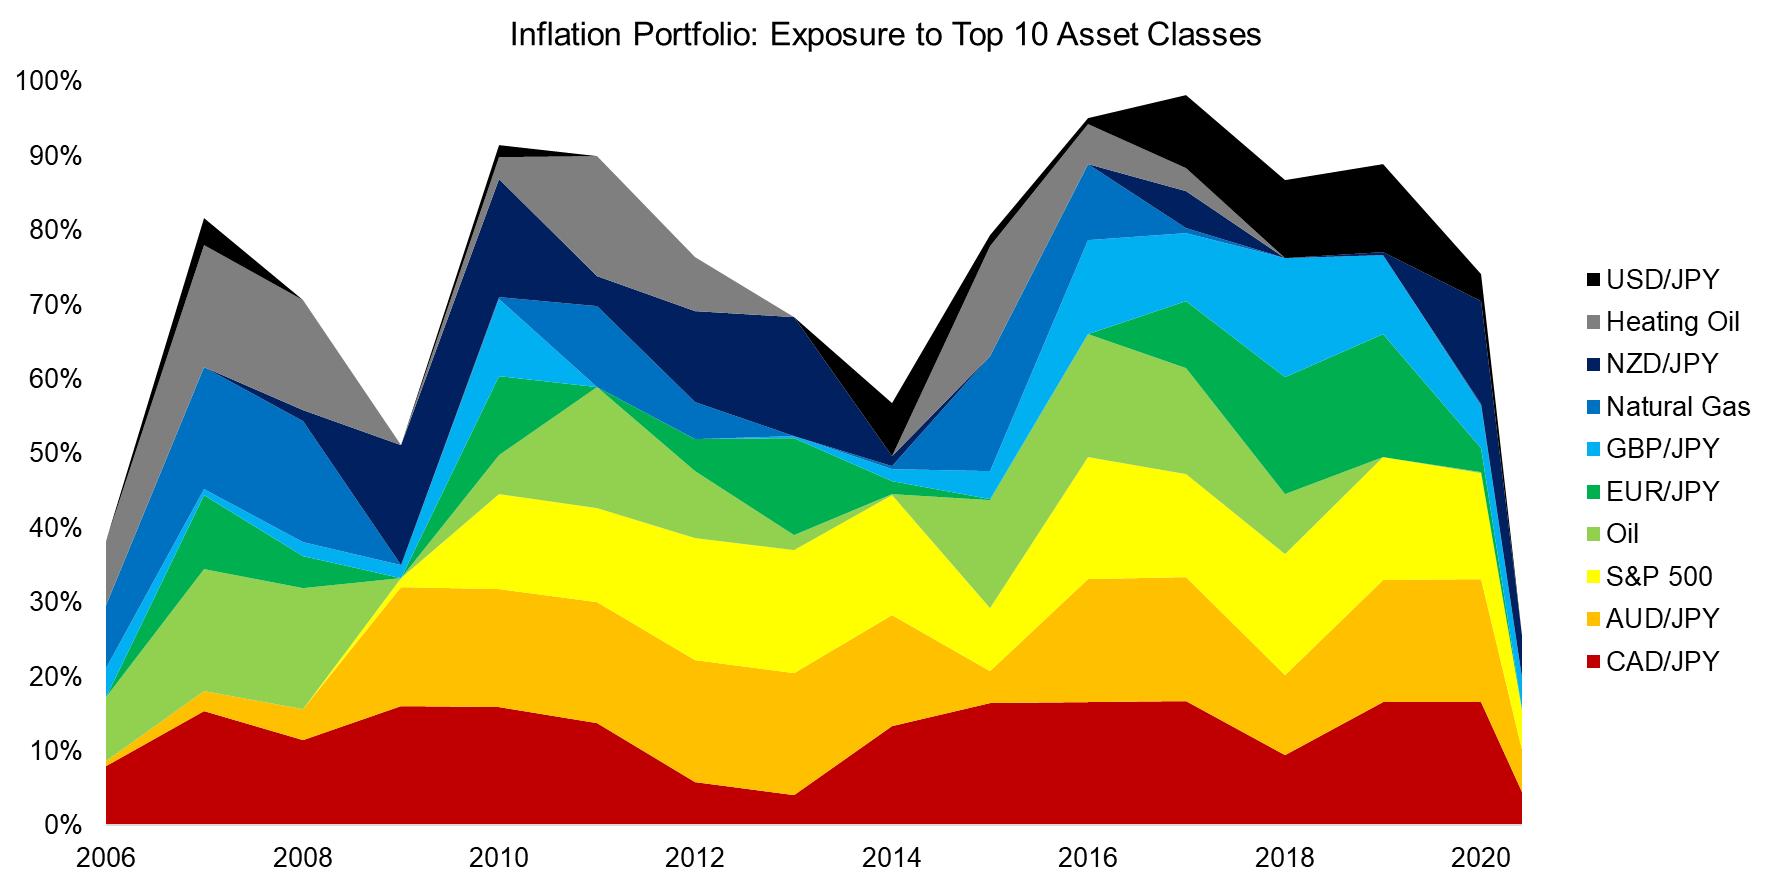 Inflation Portfolio Exposure to Top 10 Asset Classes